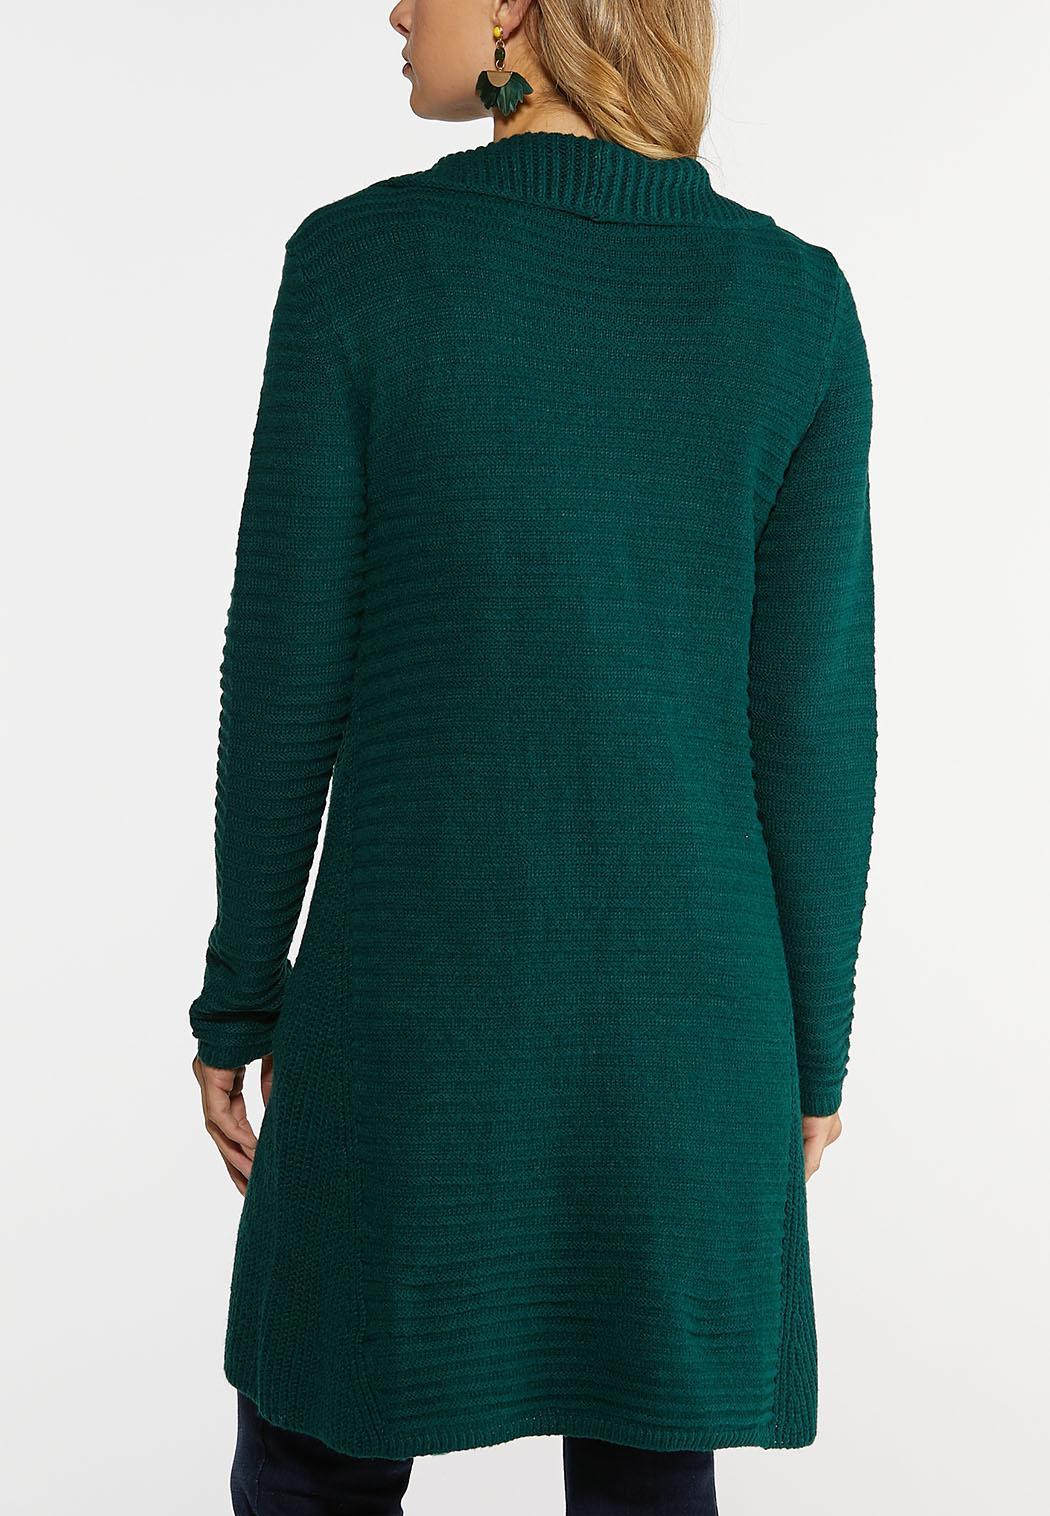 Plus Size Knit Yarn Cardigan (Item #43992717)